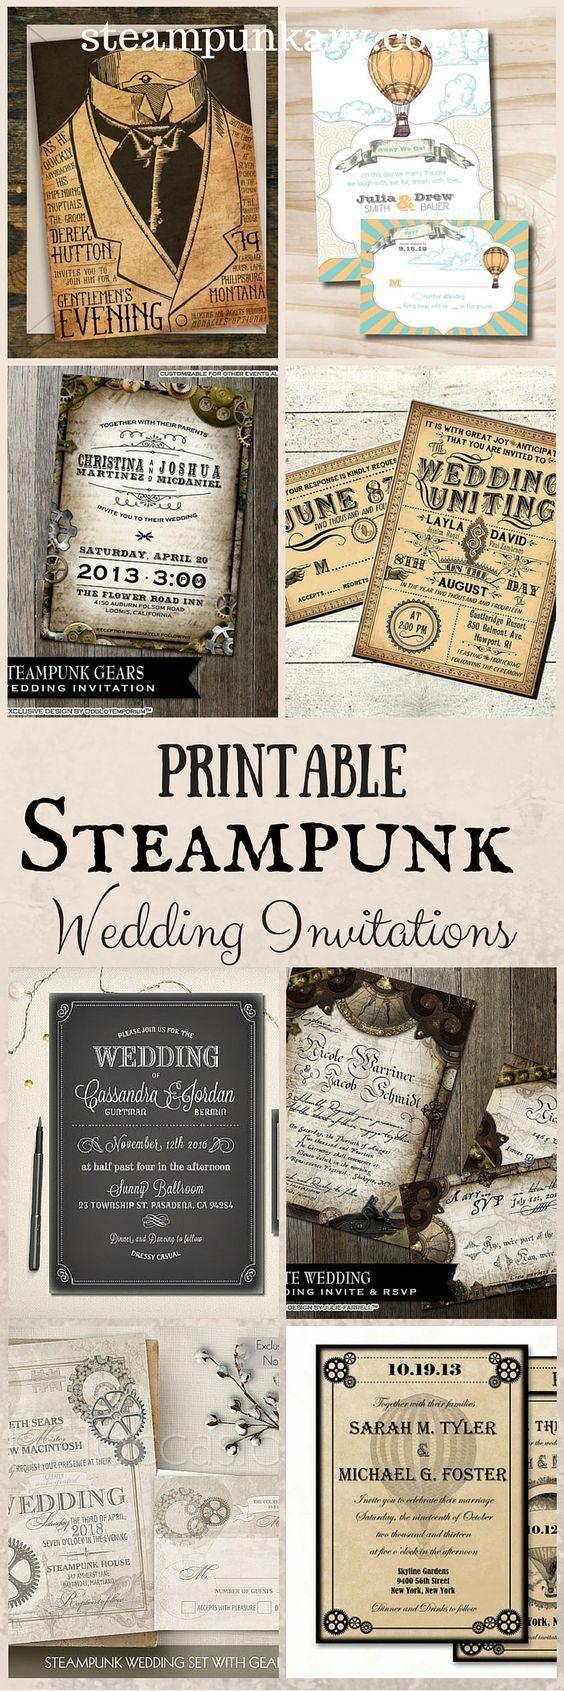 Printable Steampunk Wedding Invitations Invitation Punk